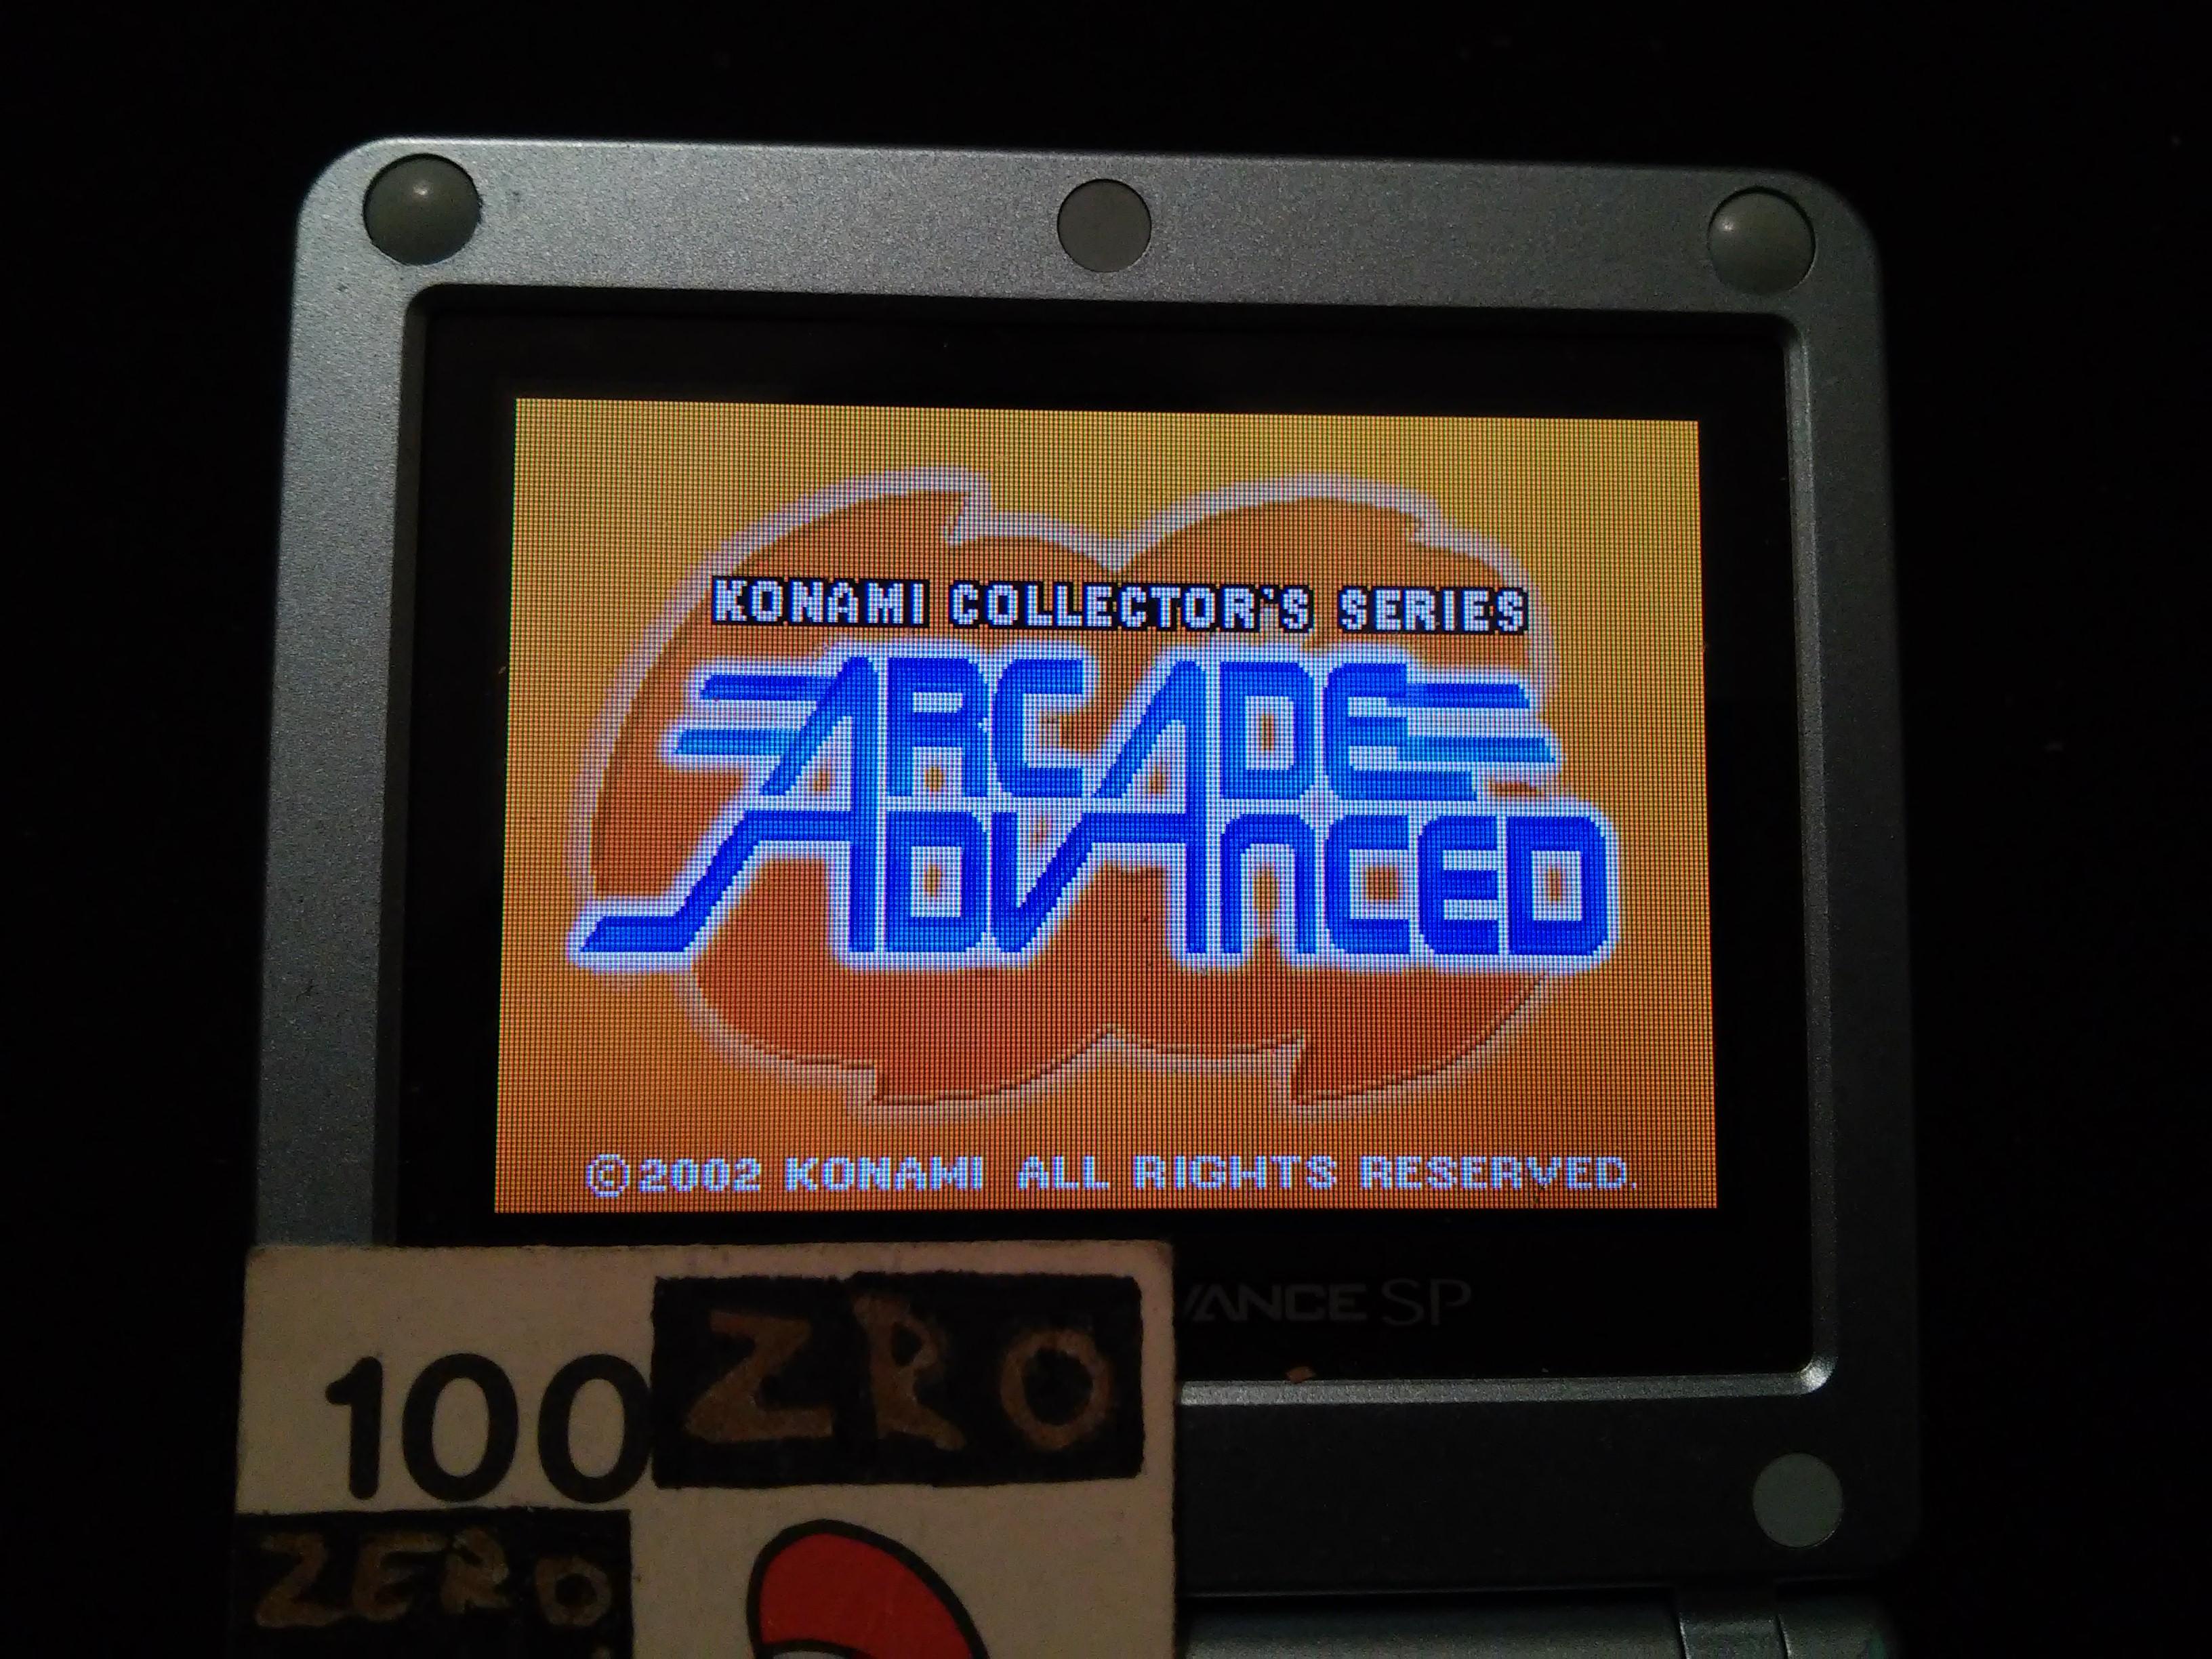 Konami Collector